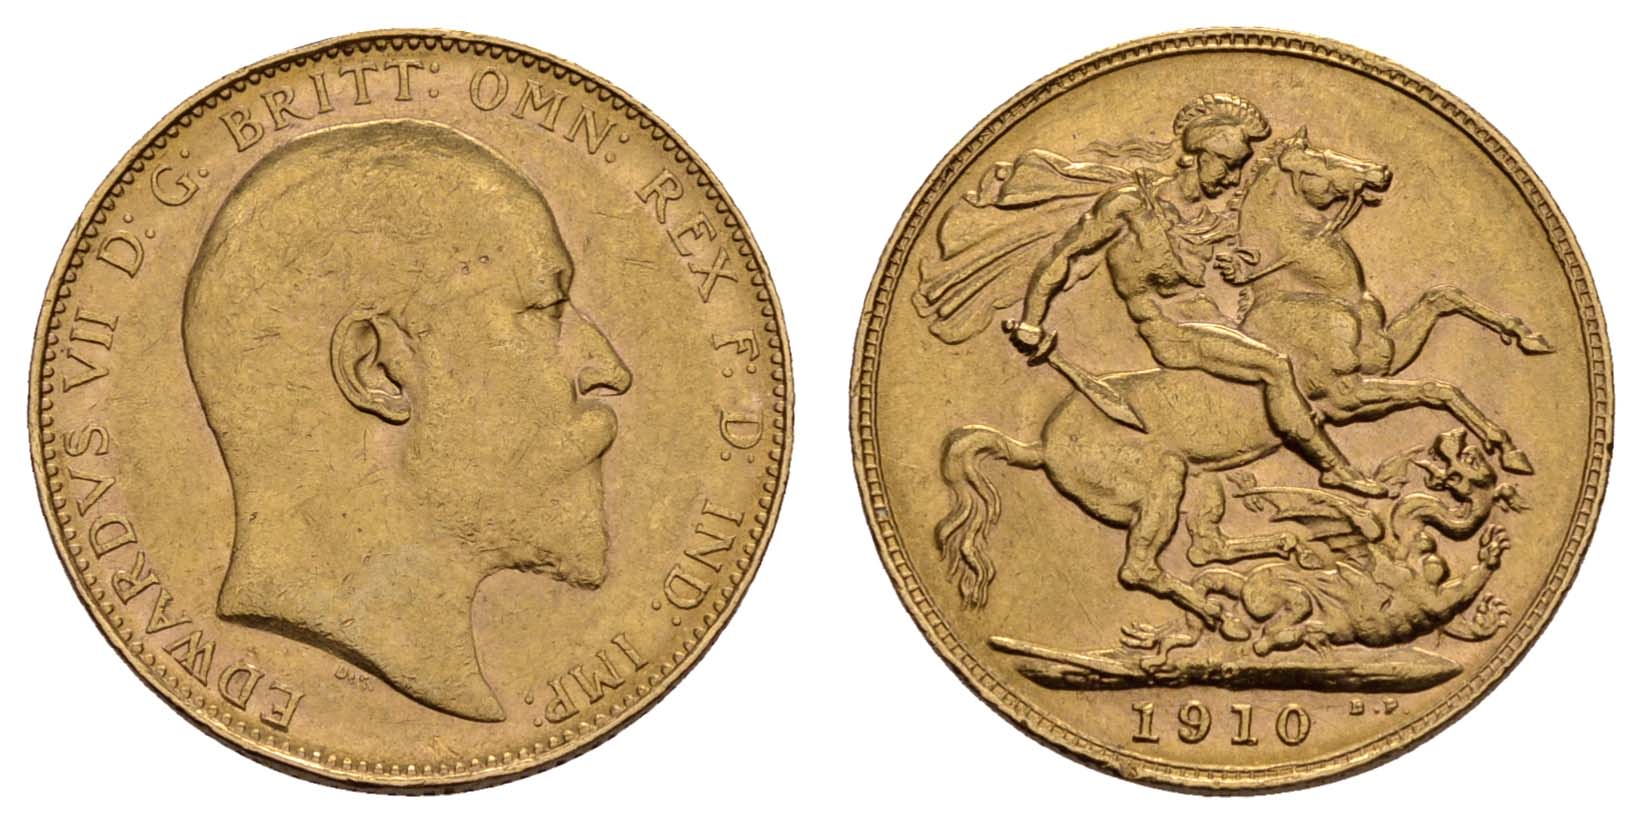 Lot 1861 - übersee australien -  Auktionshaus Ulrich Felzmann GmbH & Co. KG Coins single lots